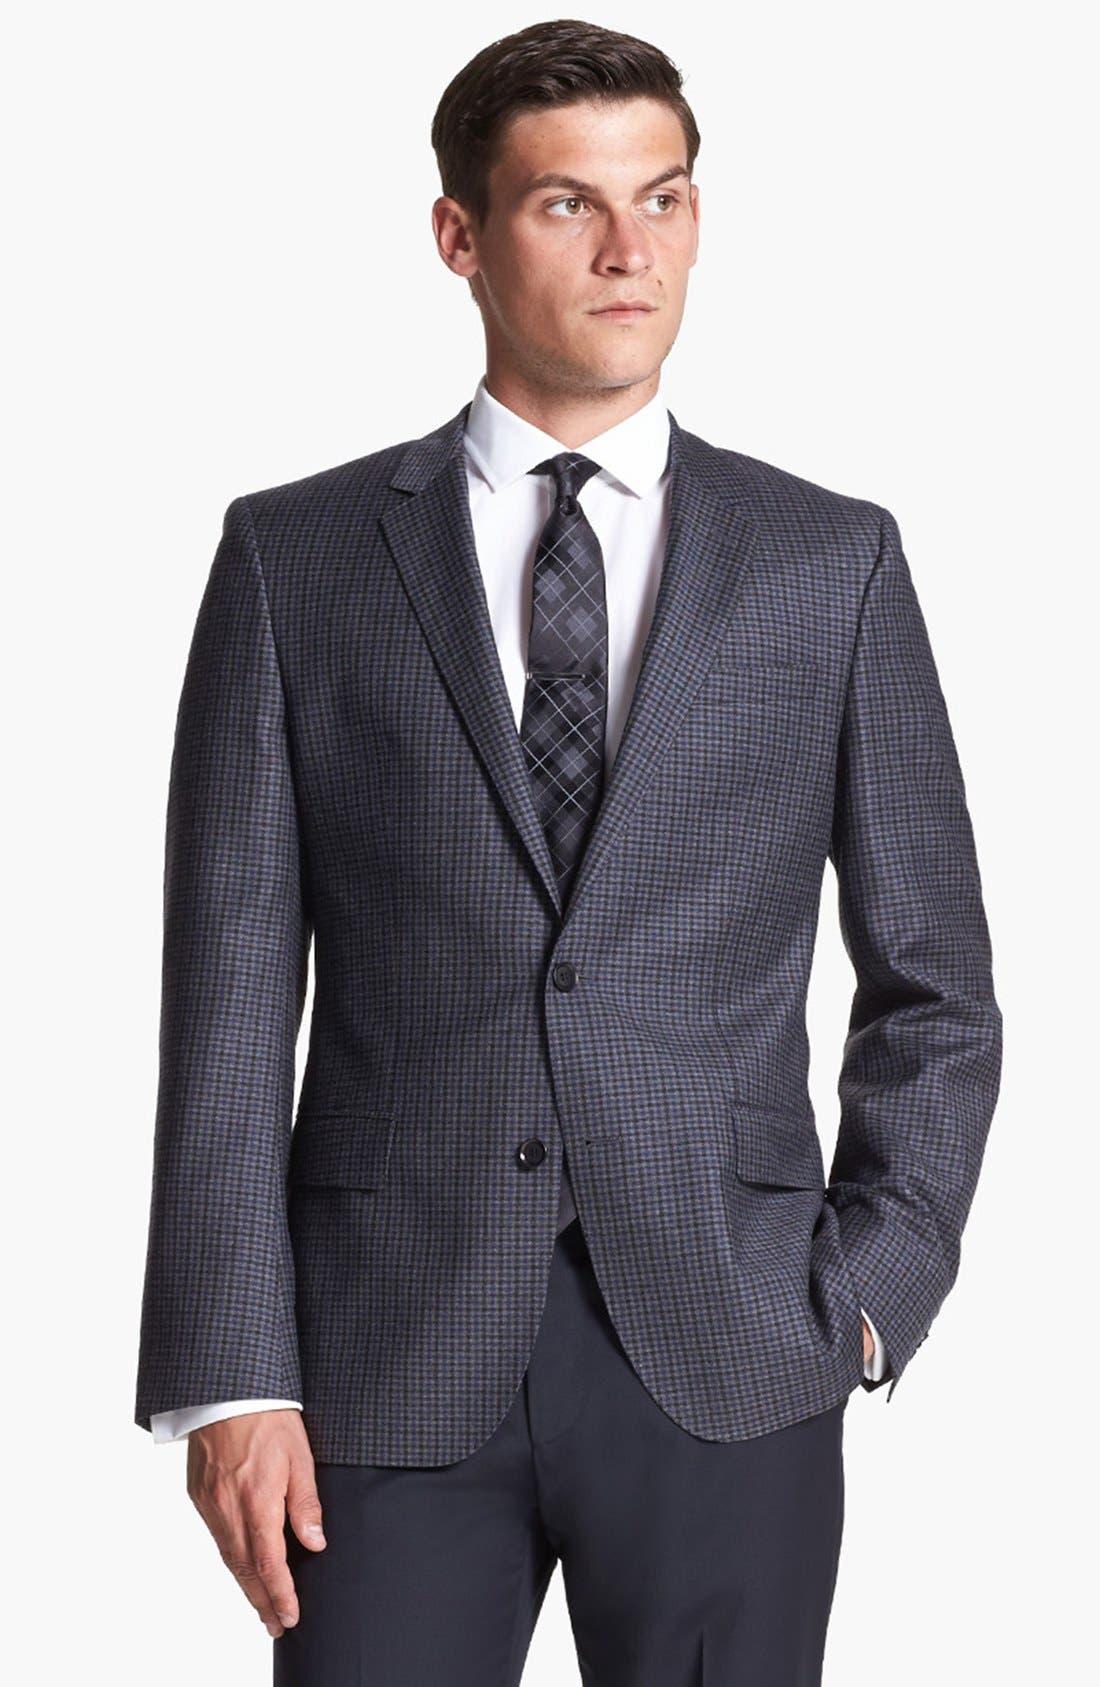 Main Image - BOSS HUGO BOSS 'Hutch' Trim Fit Check Sportcoat